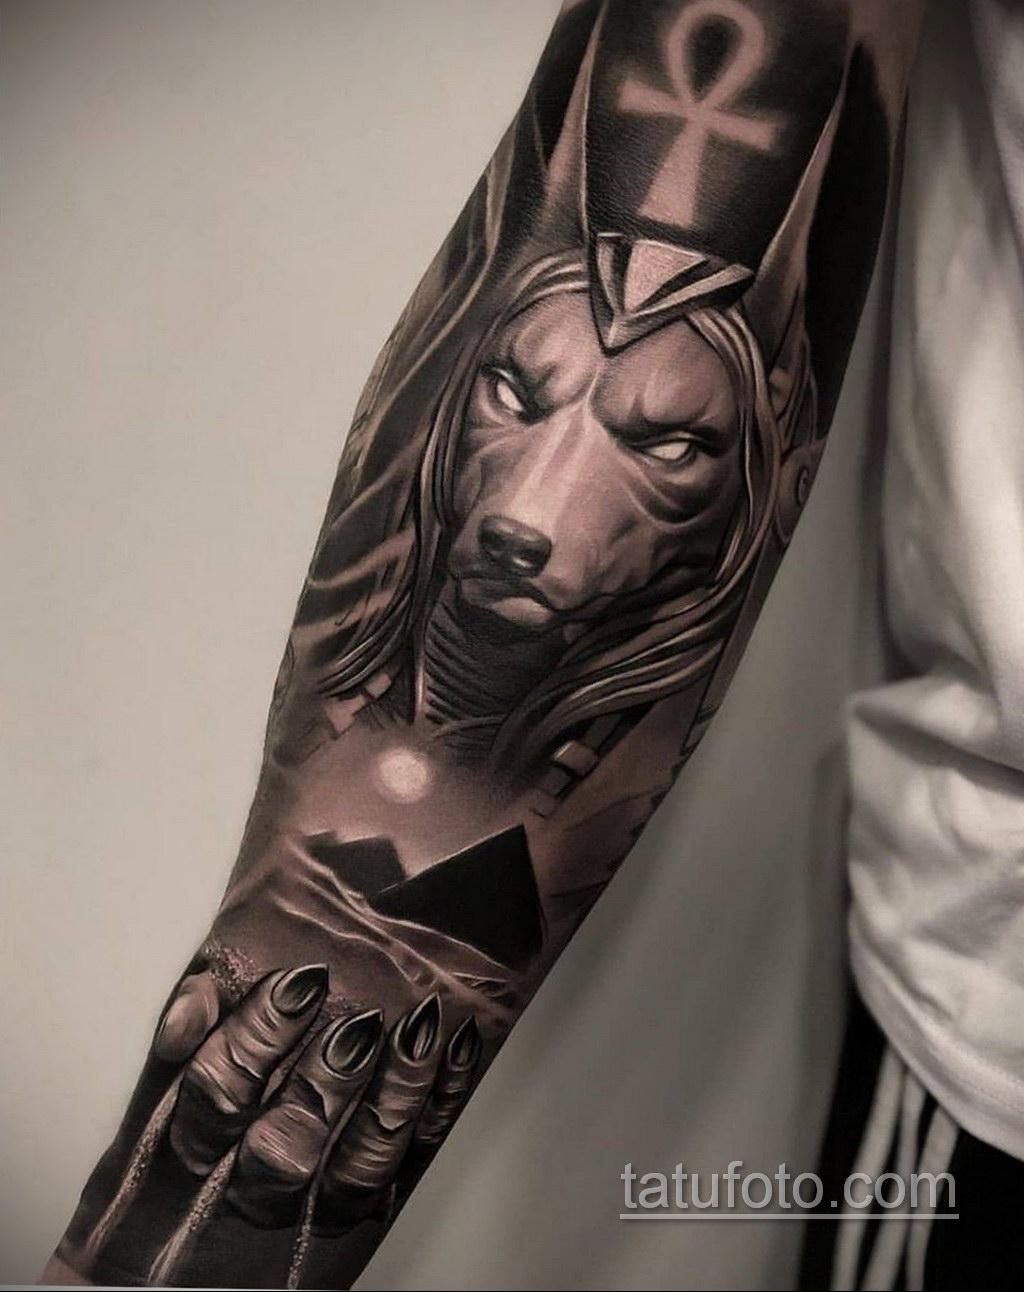 Фото анубис тату на предплечье 25.10.2020 №003 -forearm tattoo- tatufoto.com